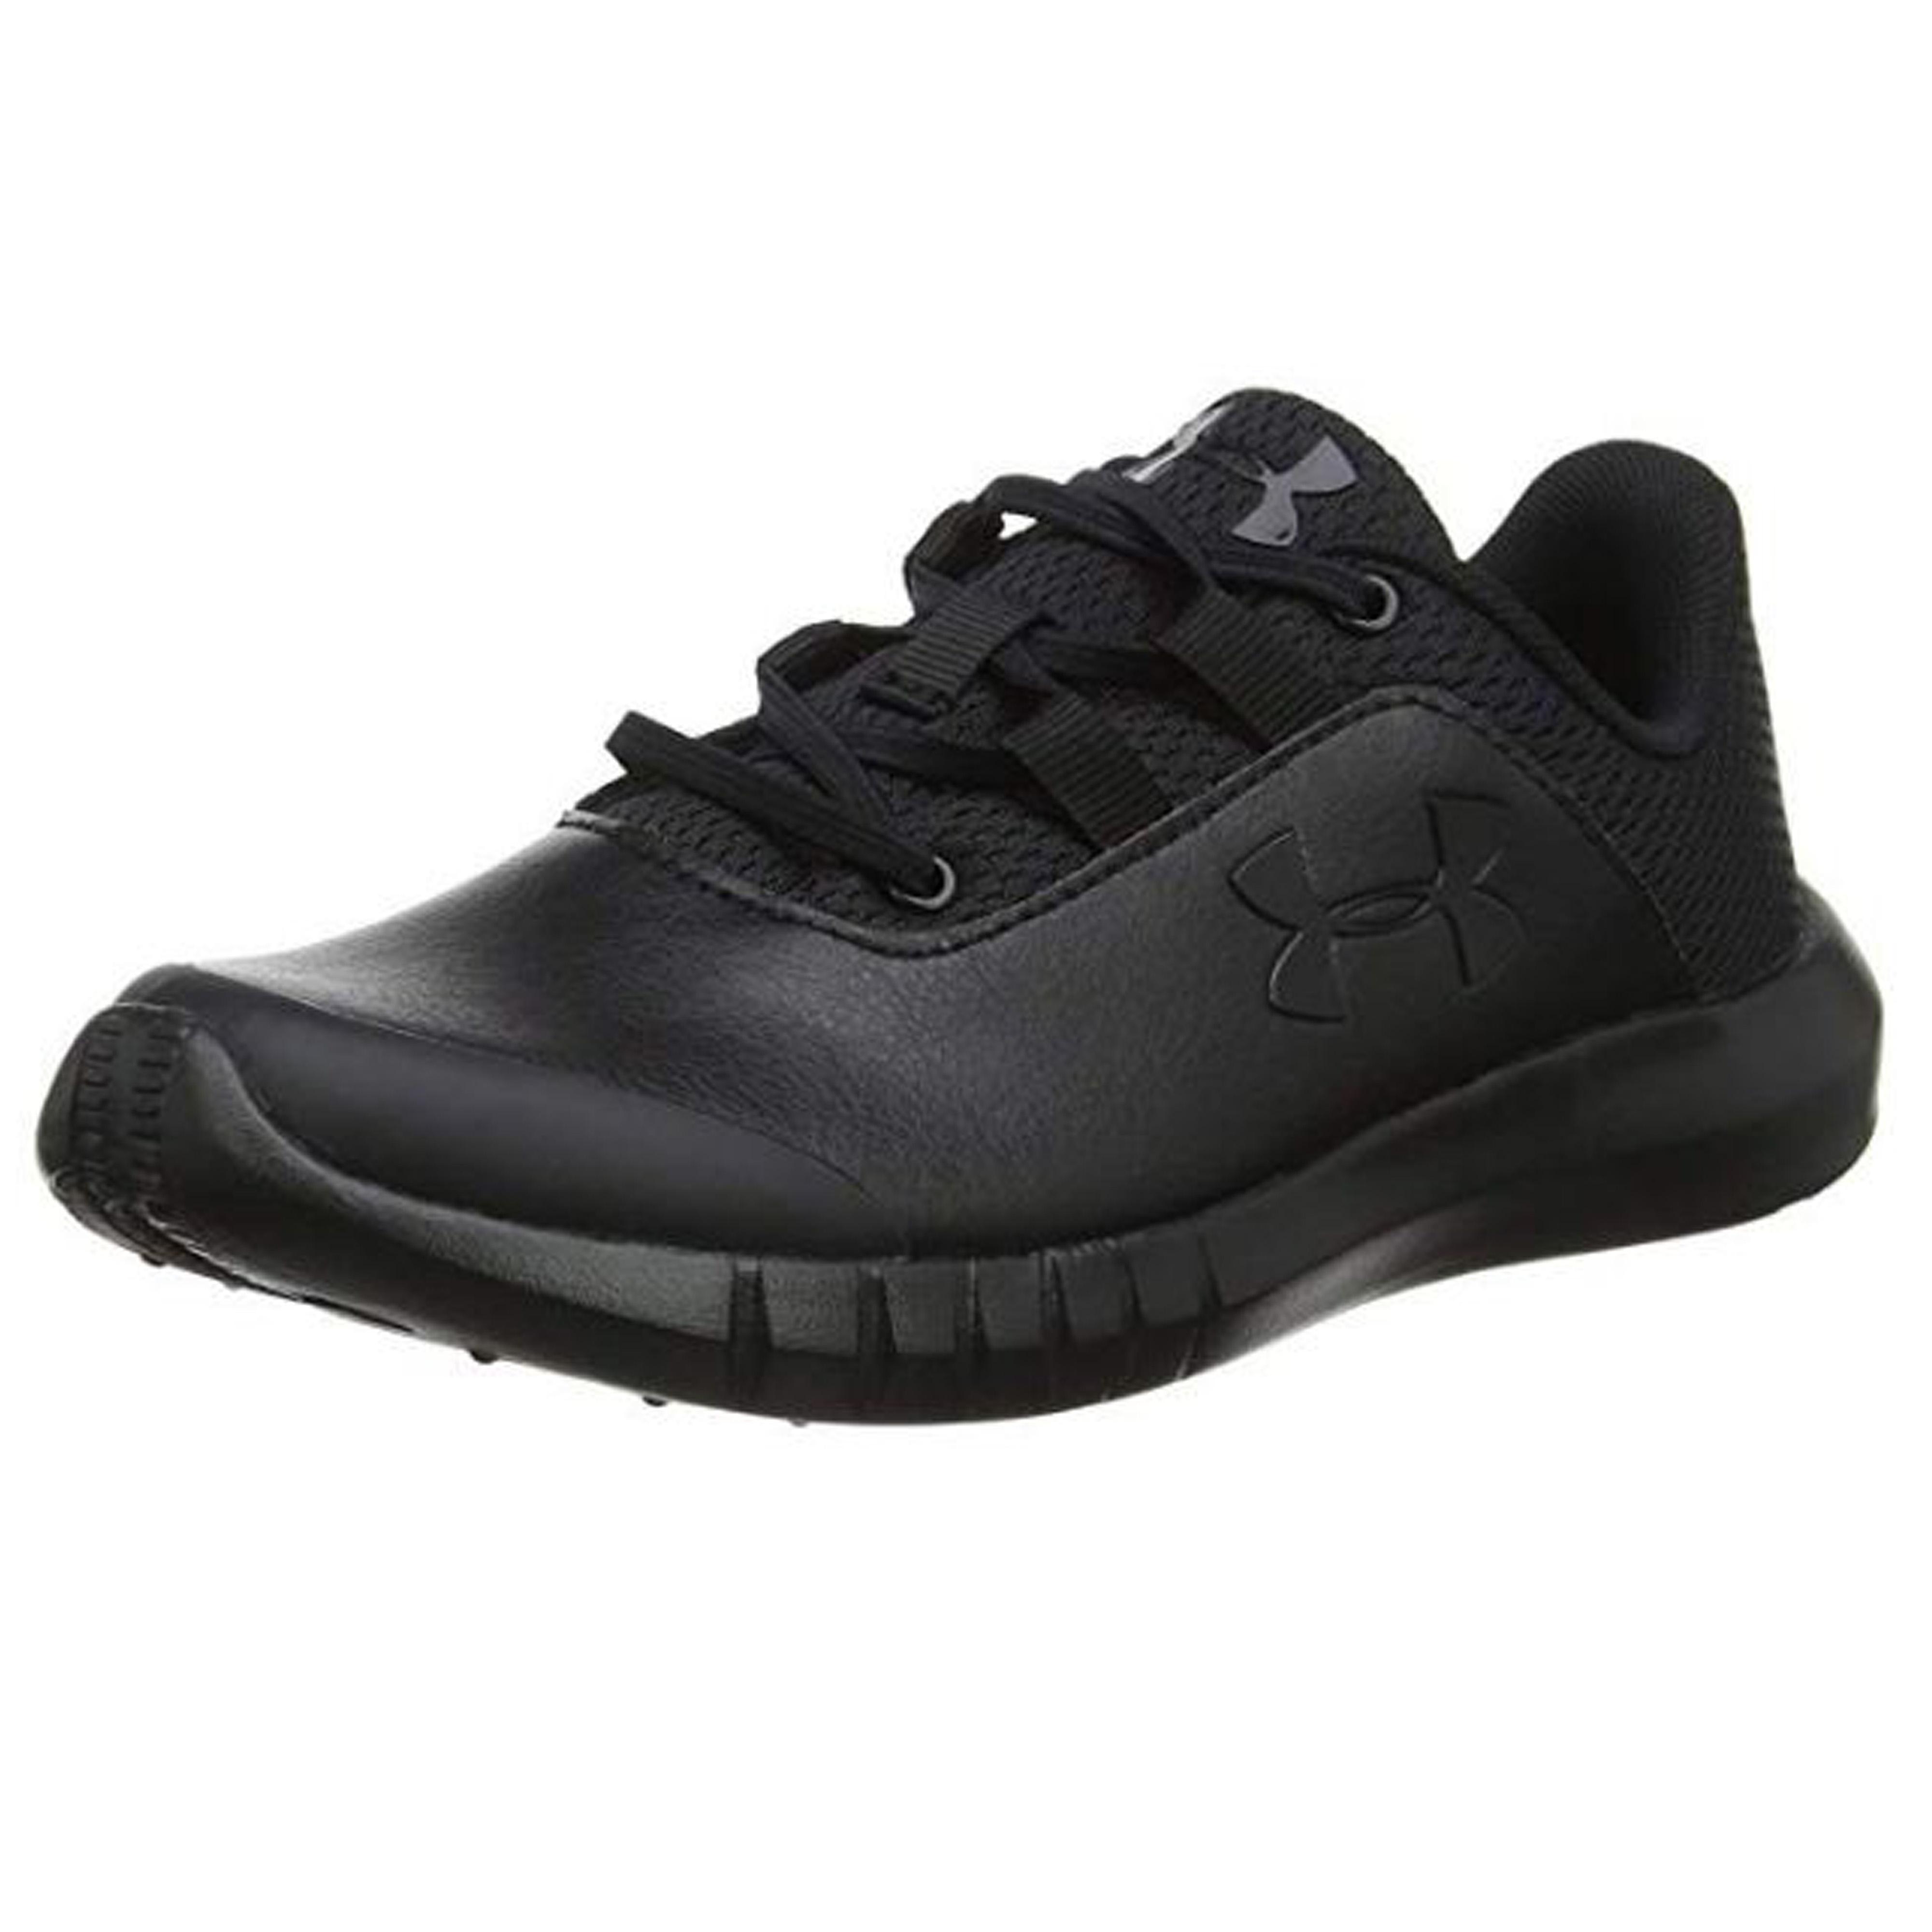 zapatos under armour para ni�os y ni�as